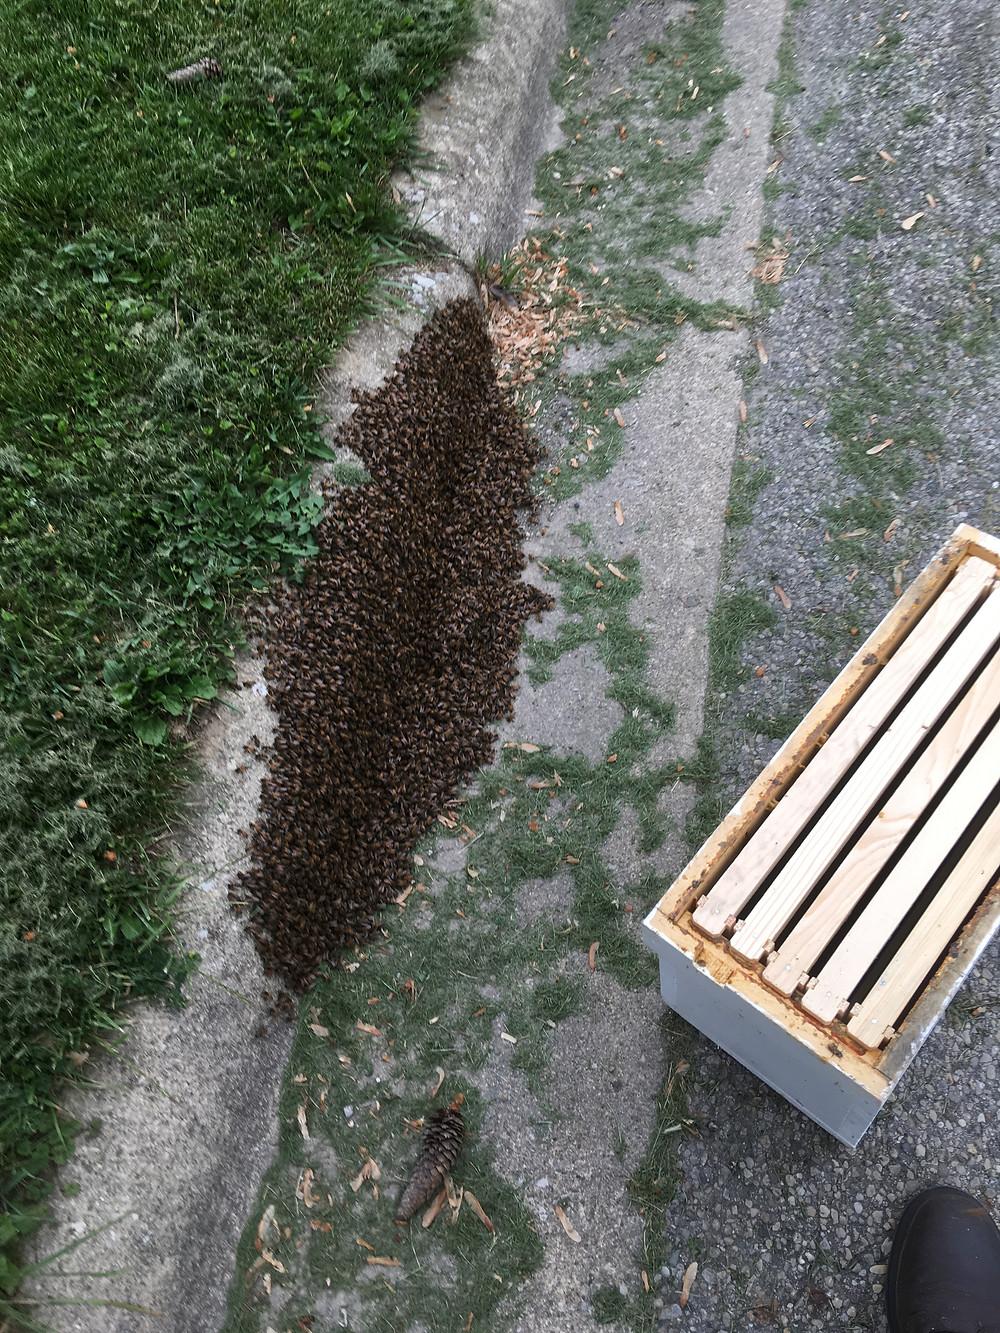 Honey bee swarm. Curb. London, Ohio. Dunham Bees.